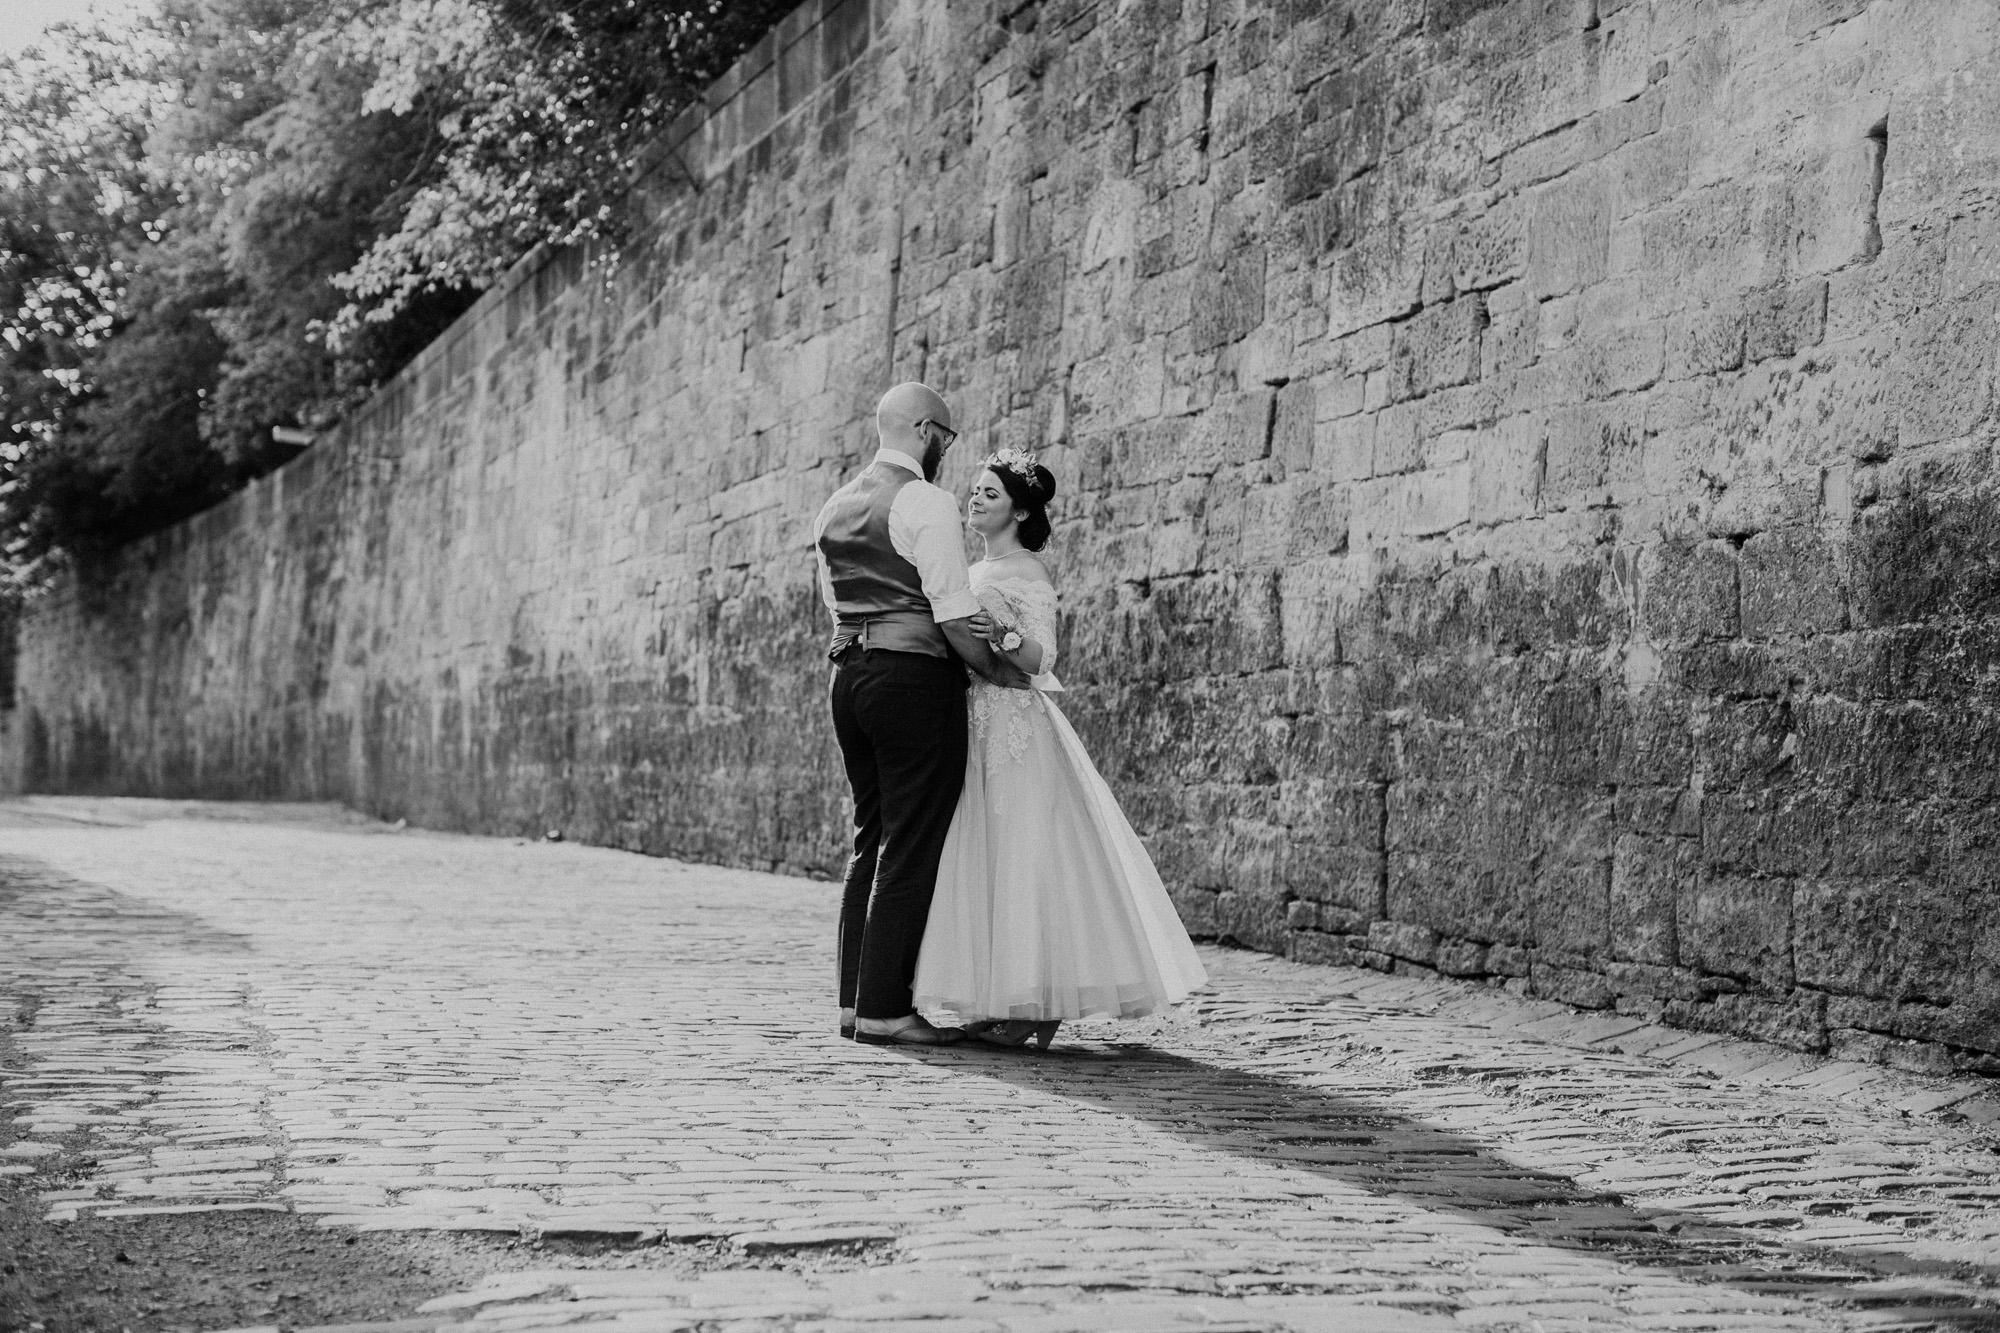 Quirky Wedding Photography Glasgow West End 061.jpg